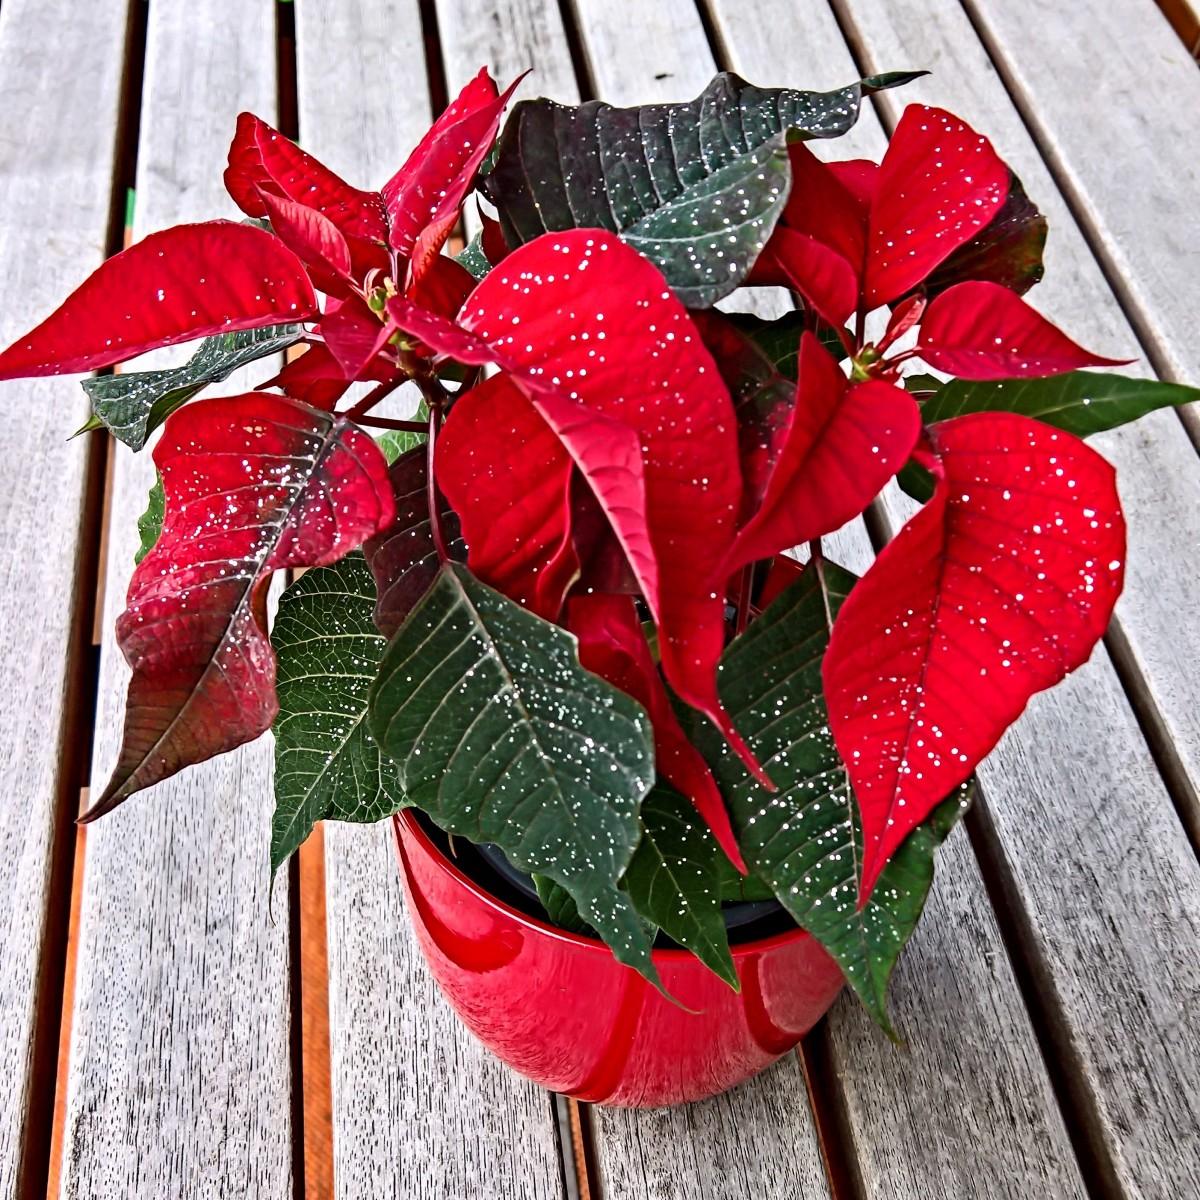 kostenlose foto natur blatt blume bl tenblatt rot makro weihnachten blumen poinsettia. Black Bedroom Furniture Sets. Home Design Ideas